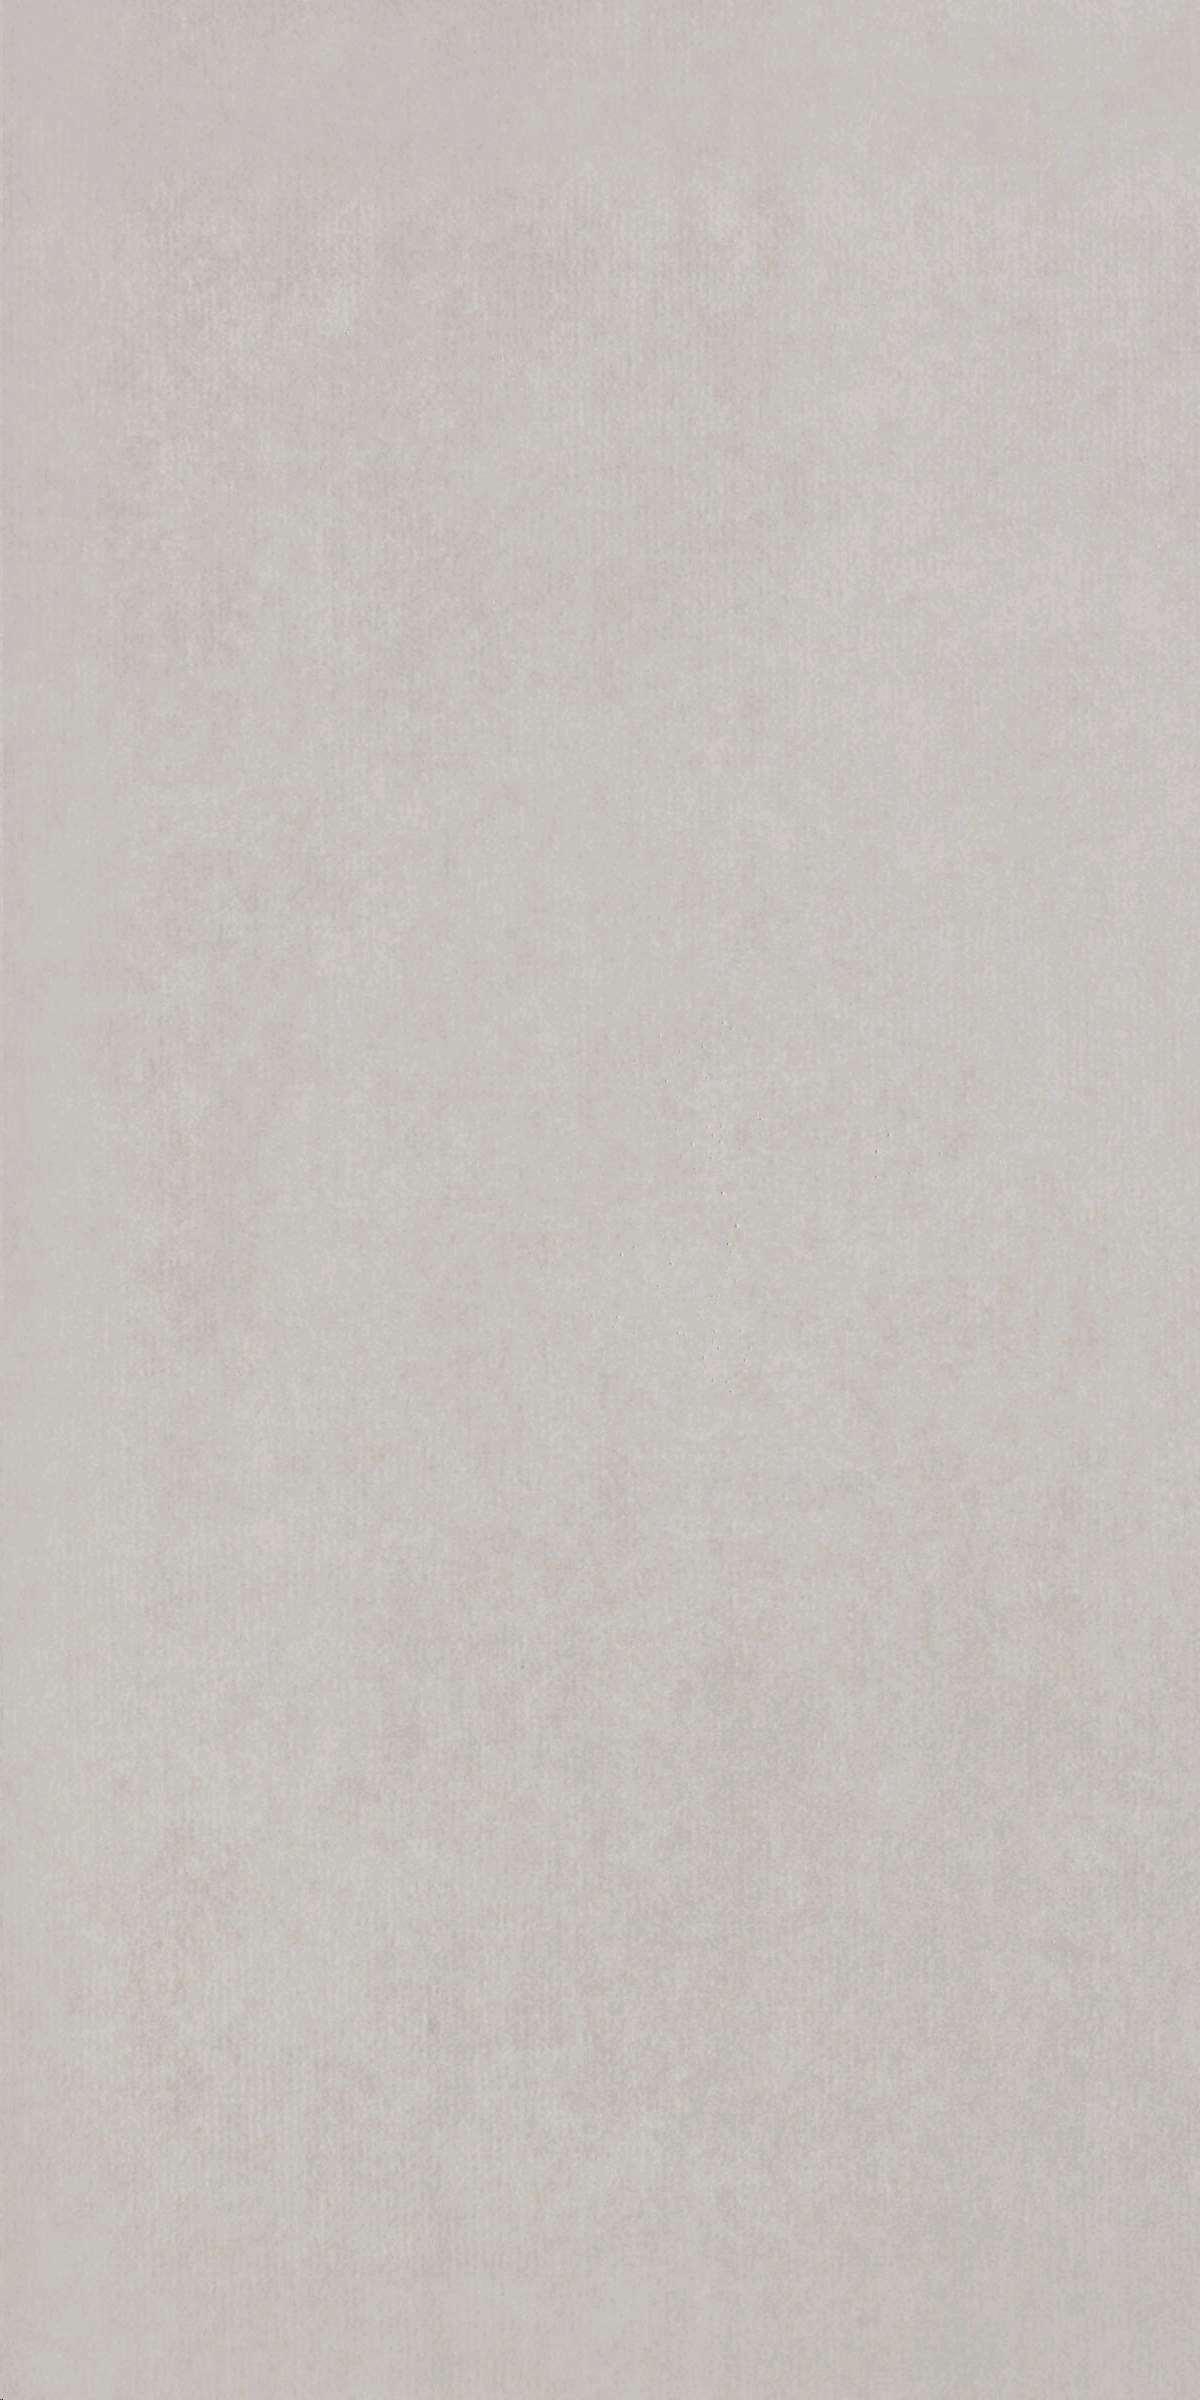 Carrelage pavigres grespor rayon argent lapp gris 60 x 30 for Carrelage metro argent